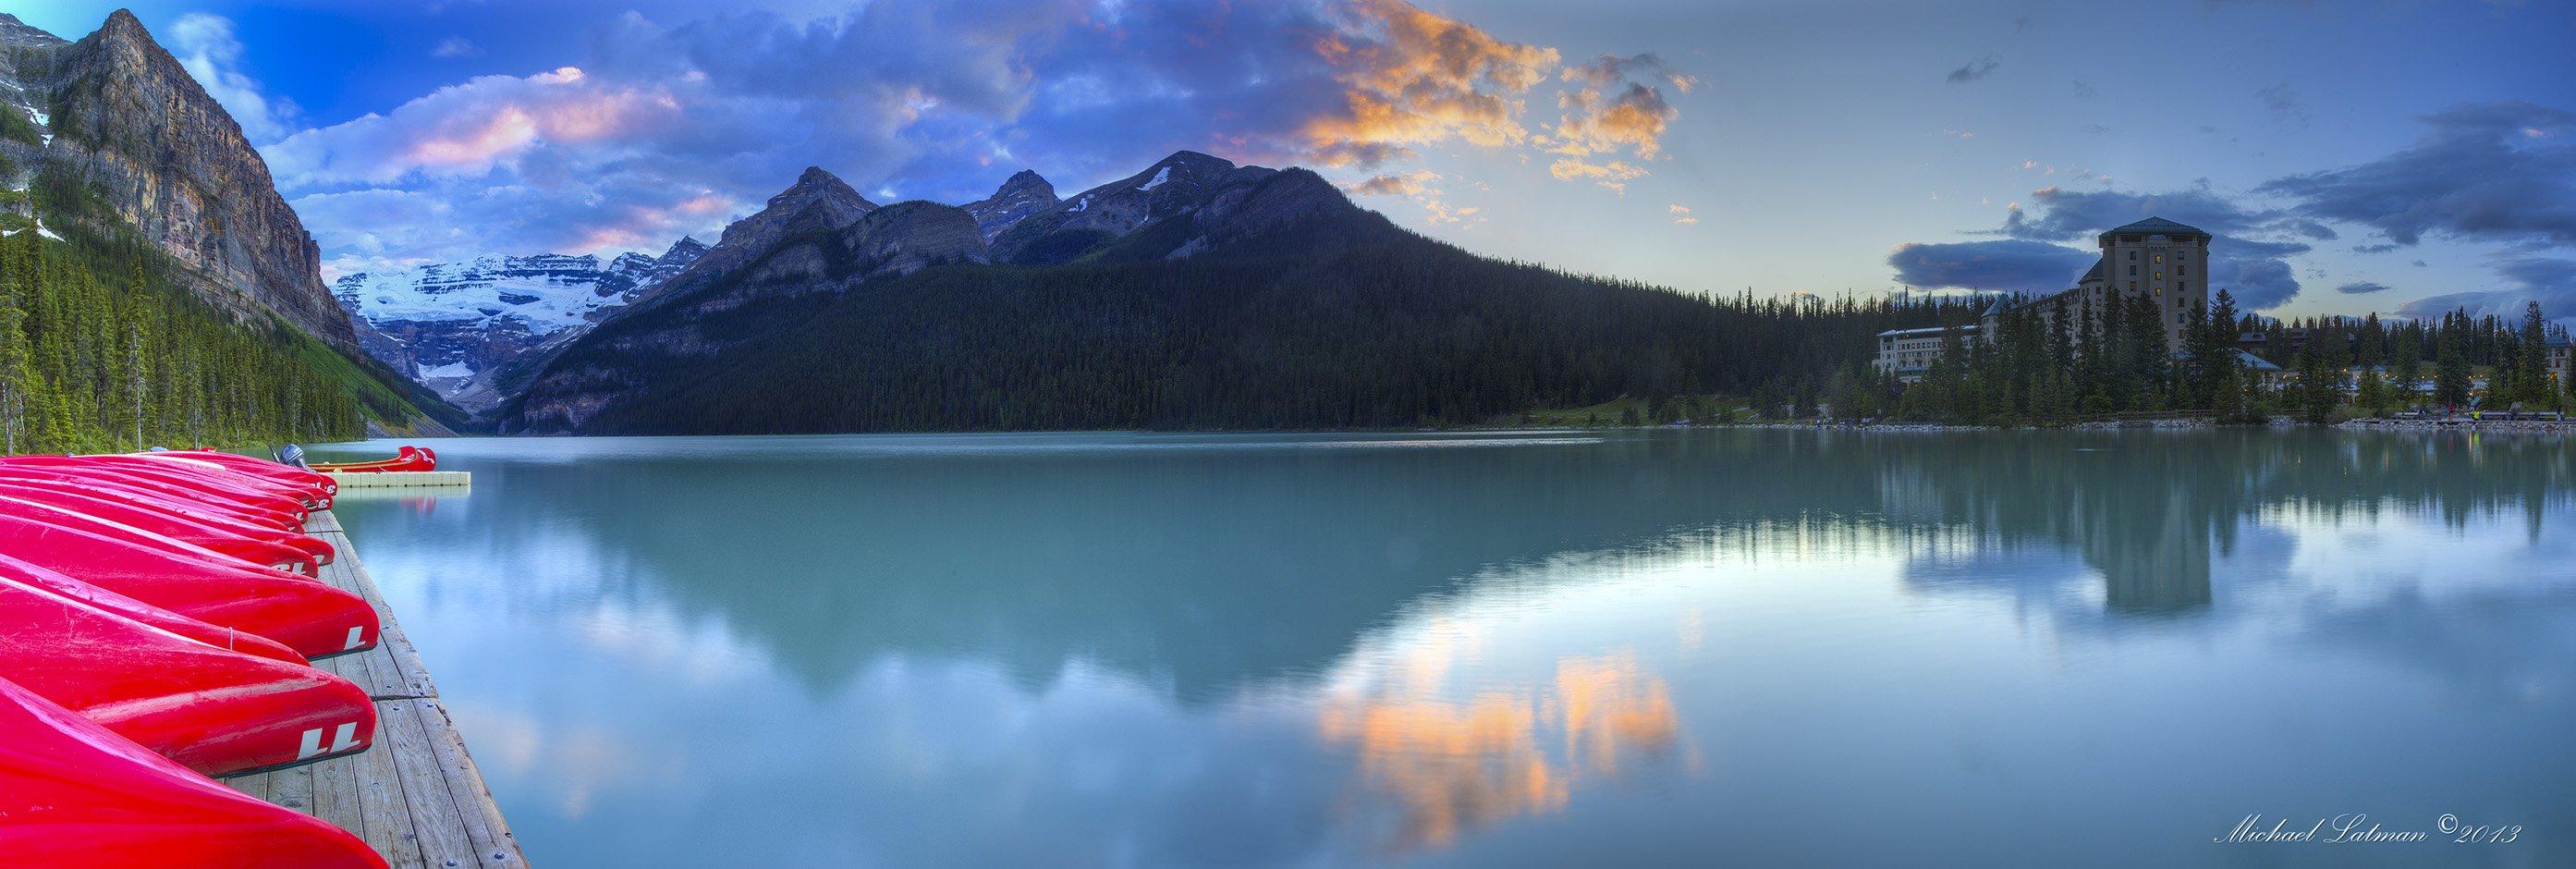 Lake, Moumtains, Summer, Sunset, Tranquility, Zen, Michael Latman